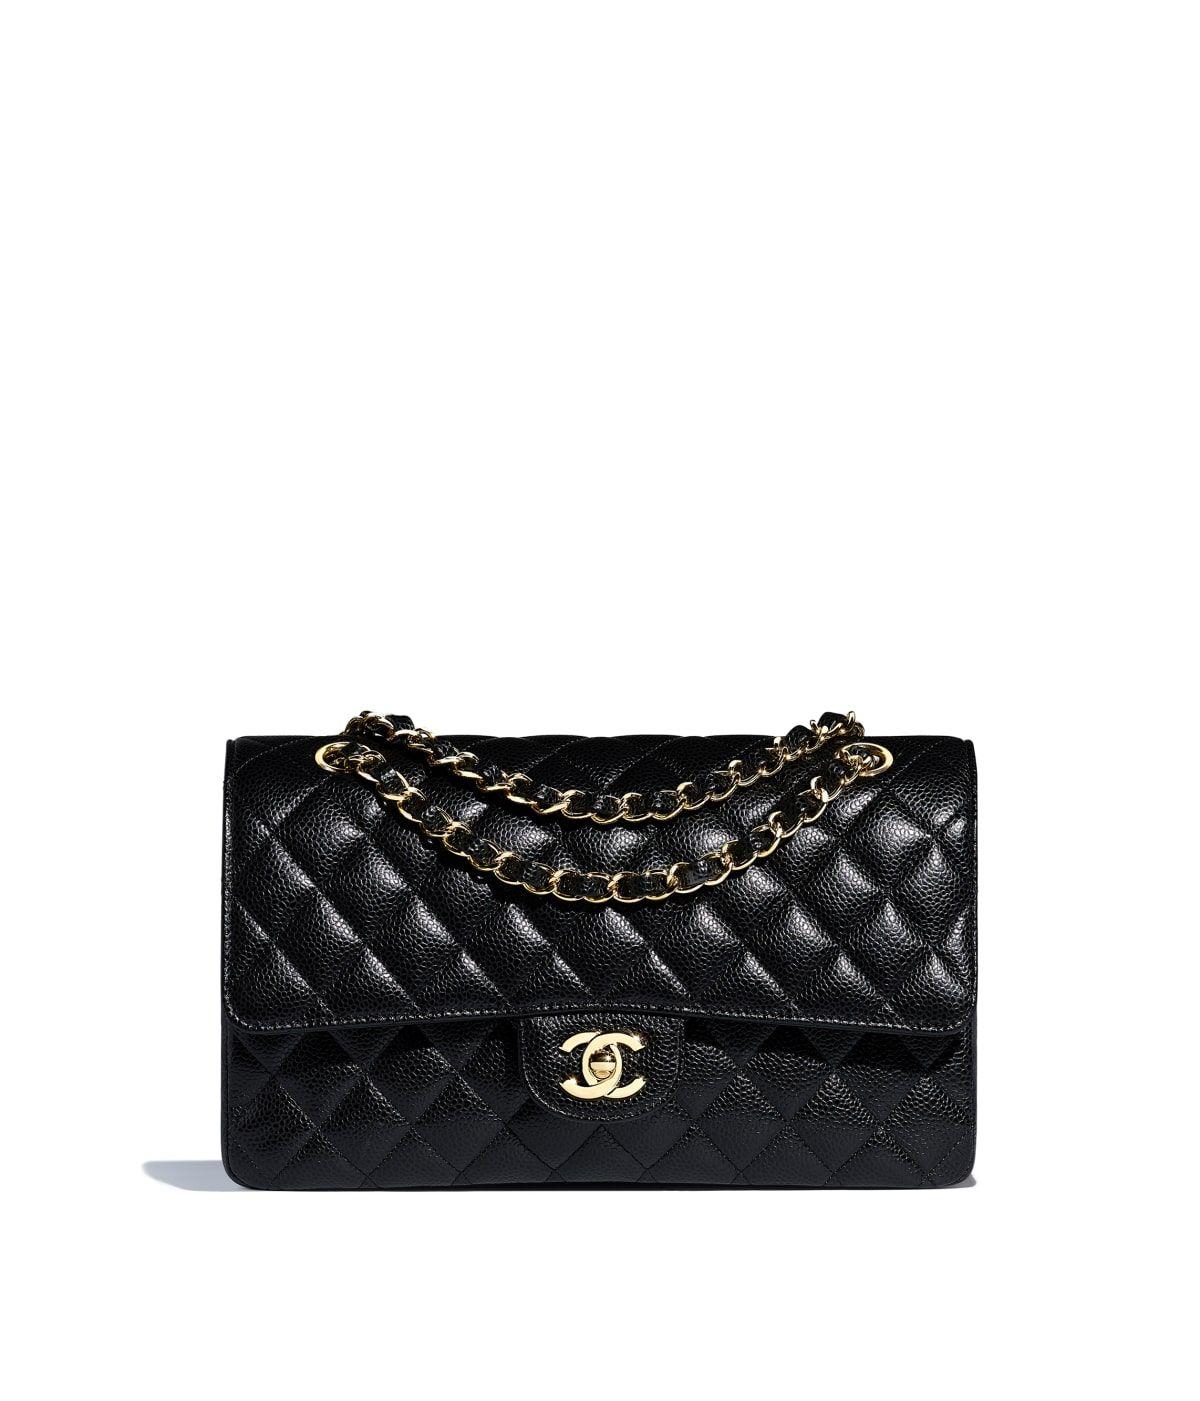 a42eee24 Grained Calfskin & Gold-Tone Metal Black Classic Handbag | Bao Bao ...